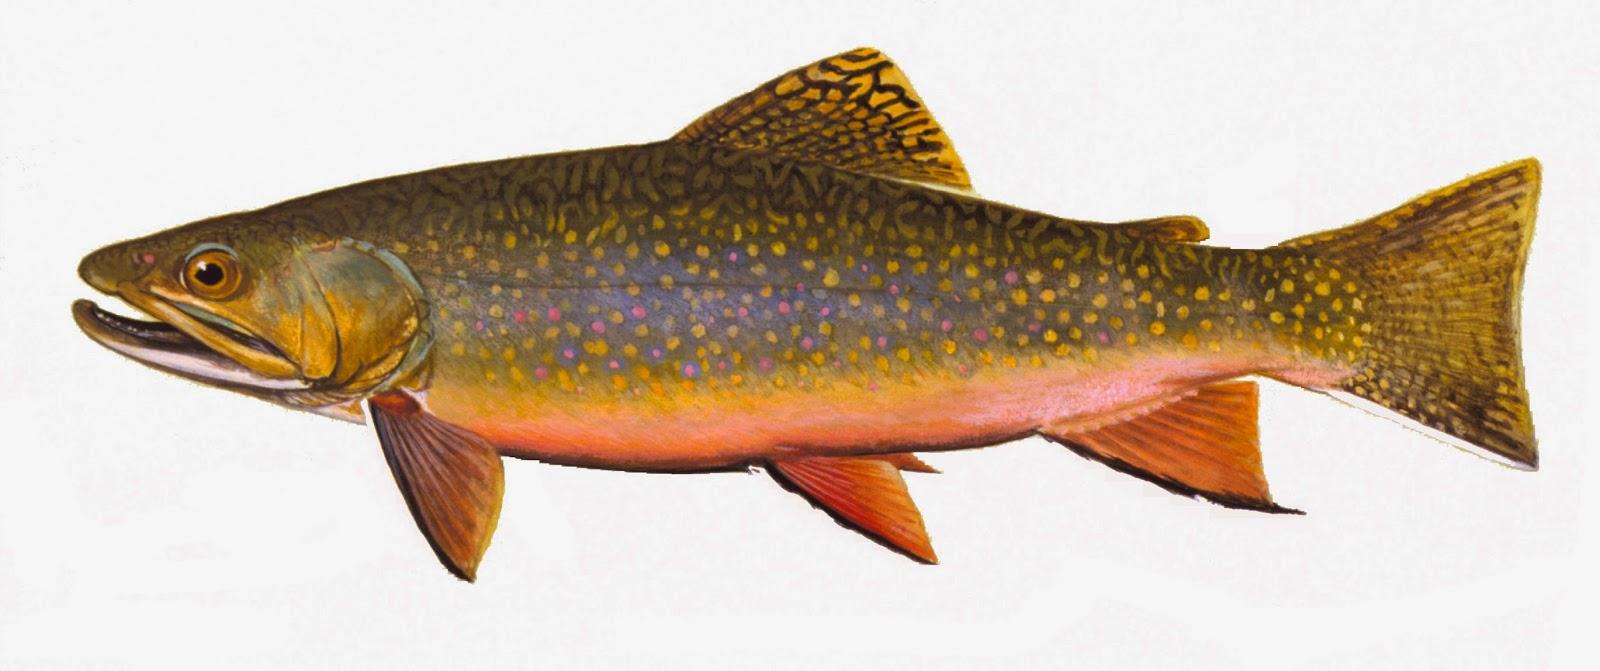 Take it outside fish iowa iowa fish species trout family for Iowa fish hatcheries